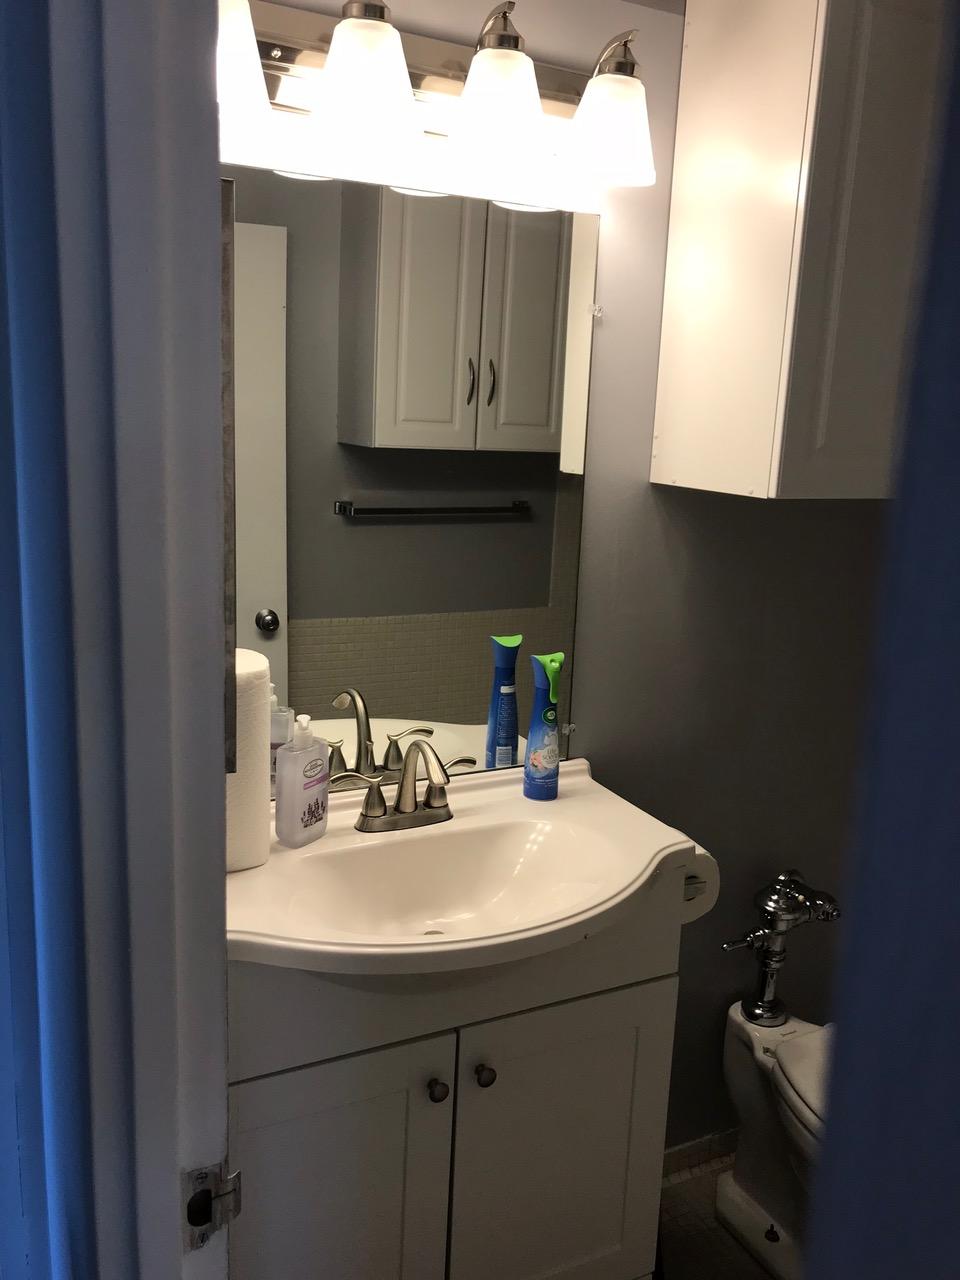 Bathroom - Hinton Real Estate Group